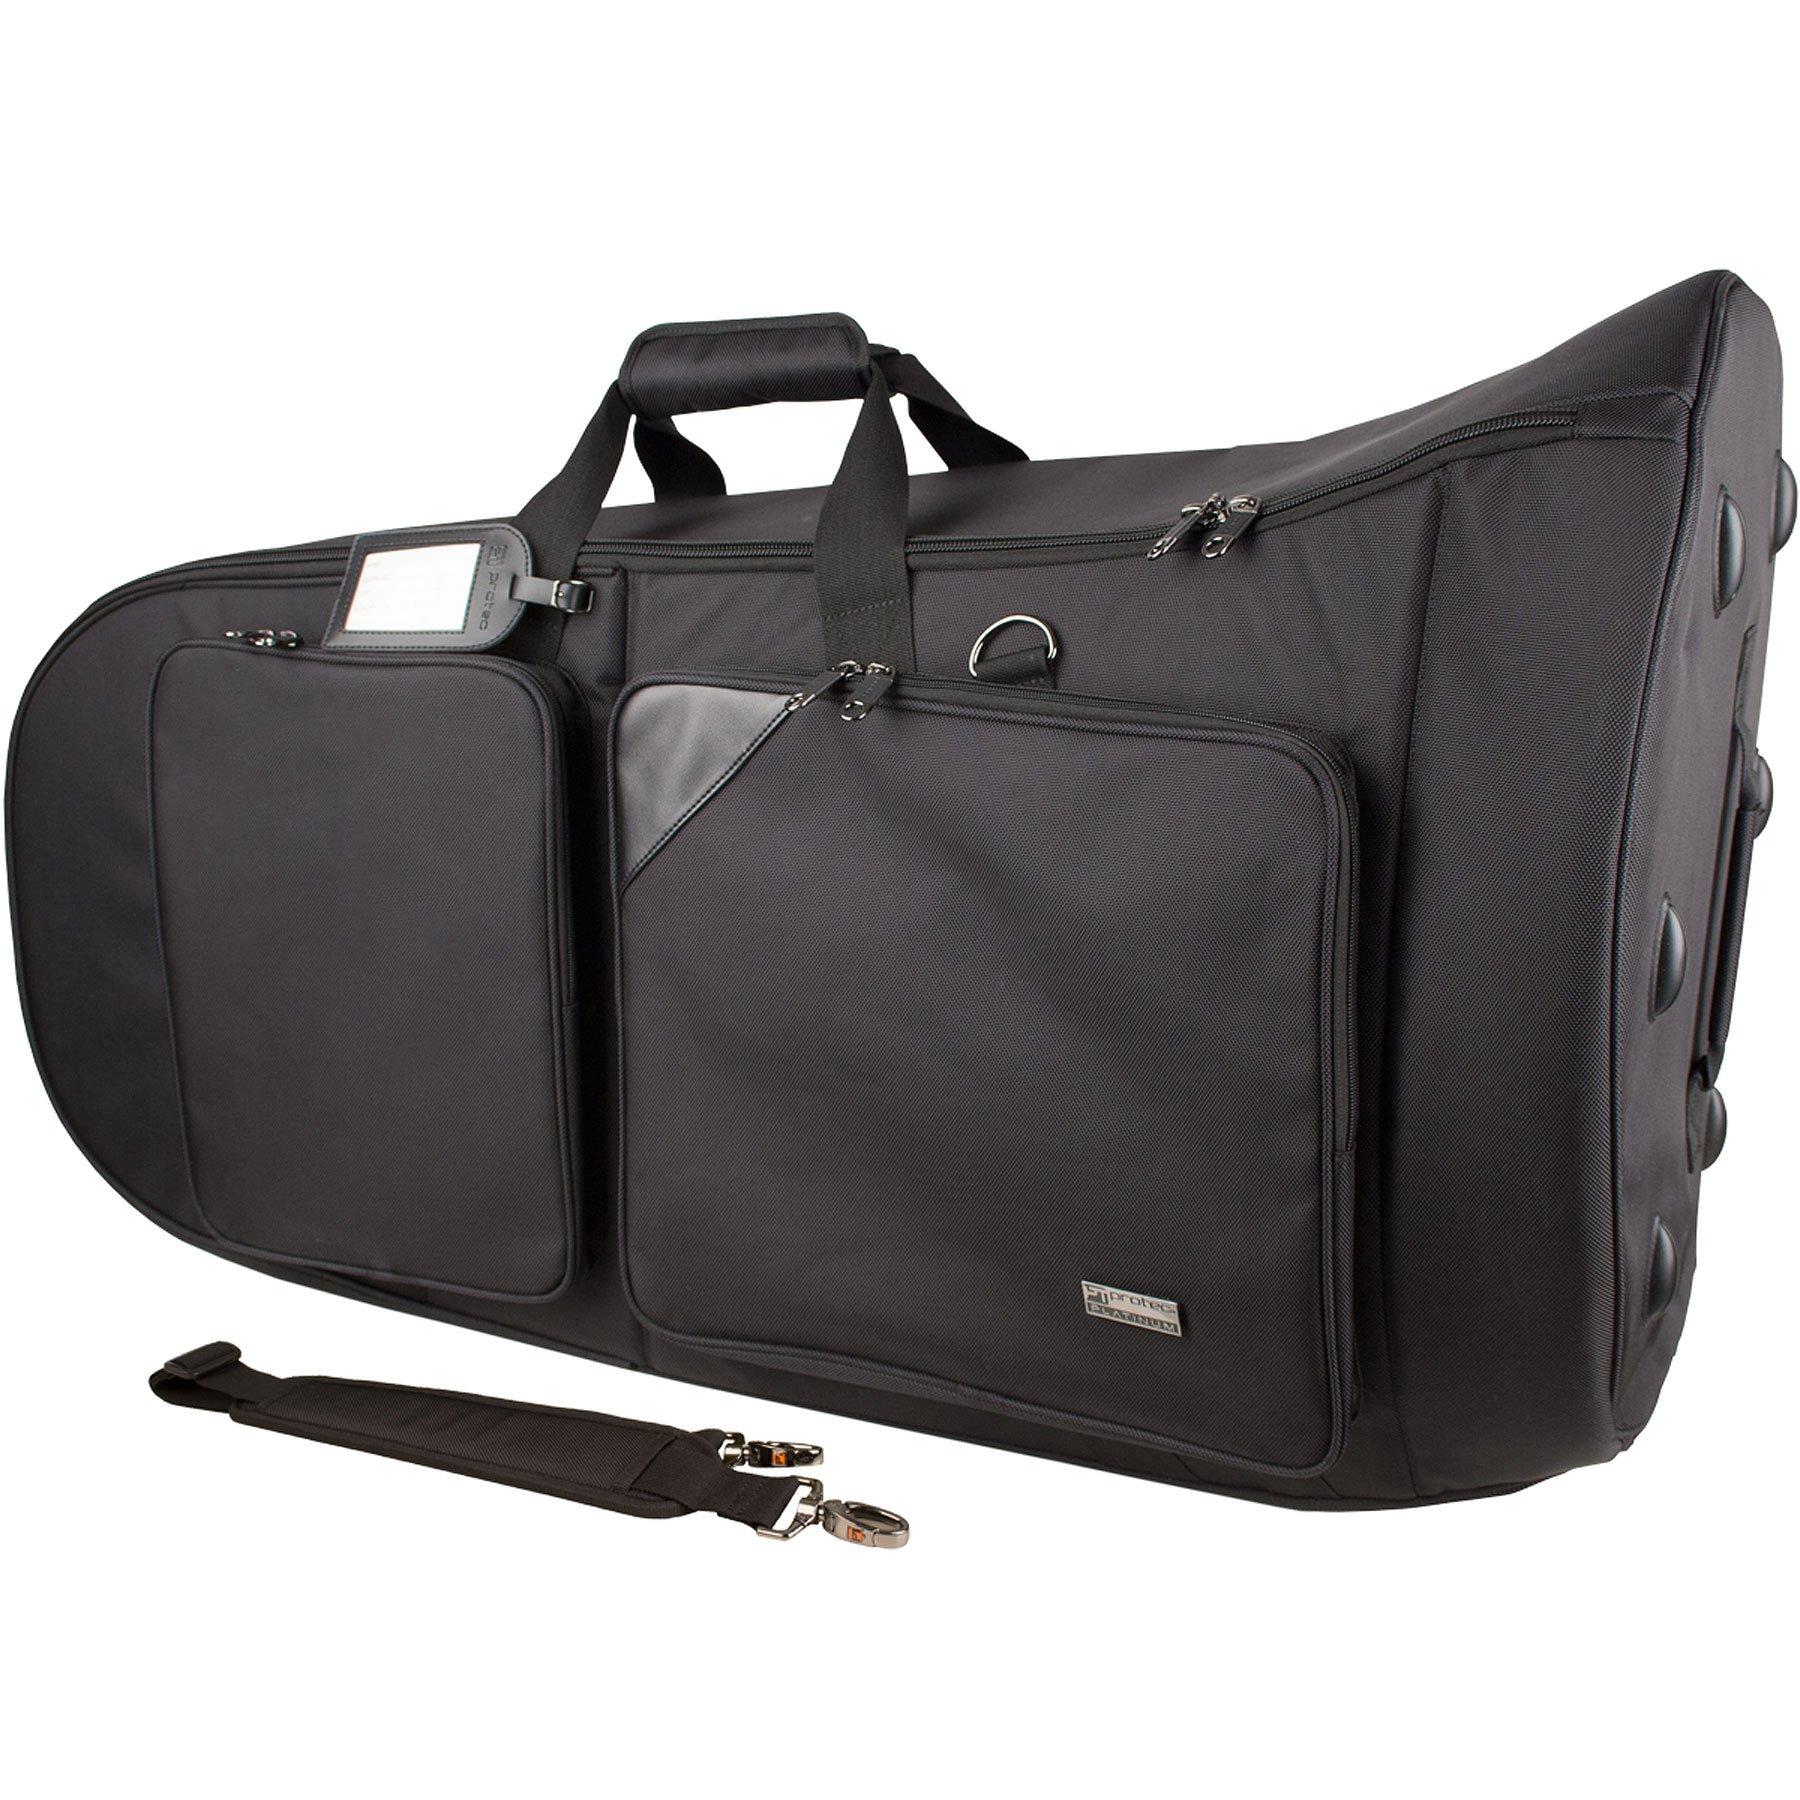 Pro Tec PL251 Smaller Tuba Gig Bag, Platinum Series